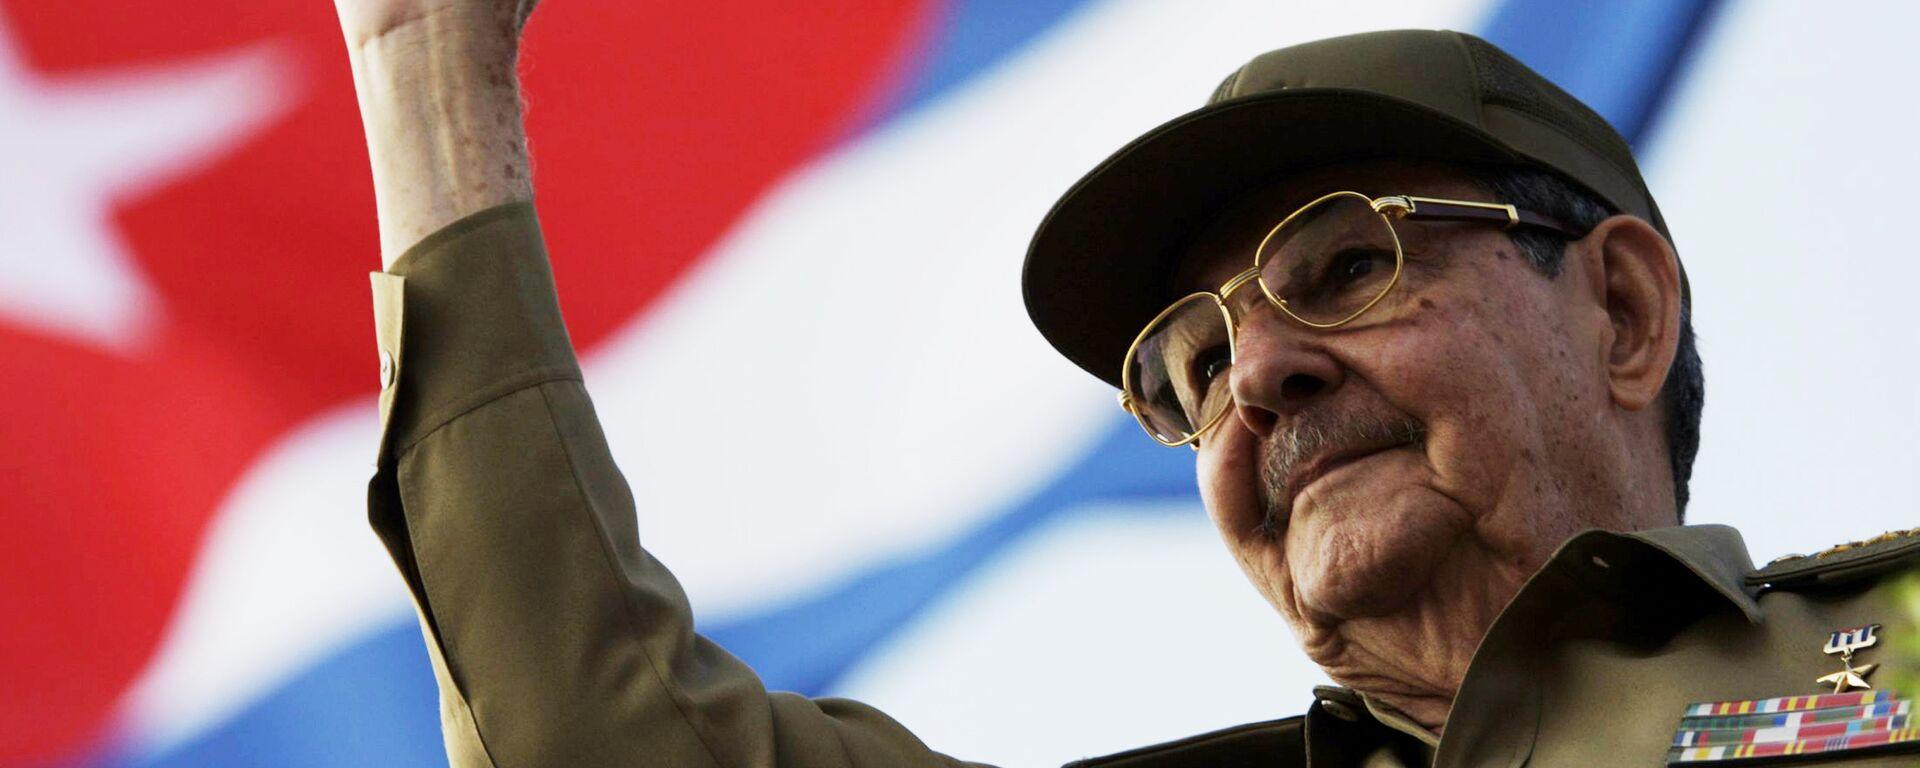 Raúl Castro, presidente de Cuba - Sputnik Mundo, 1920, 16.04.2021